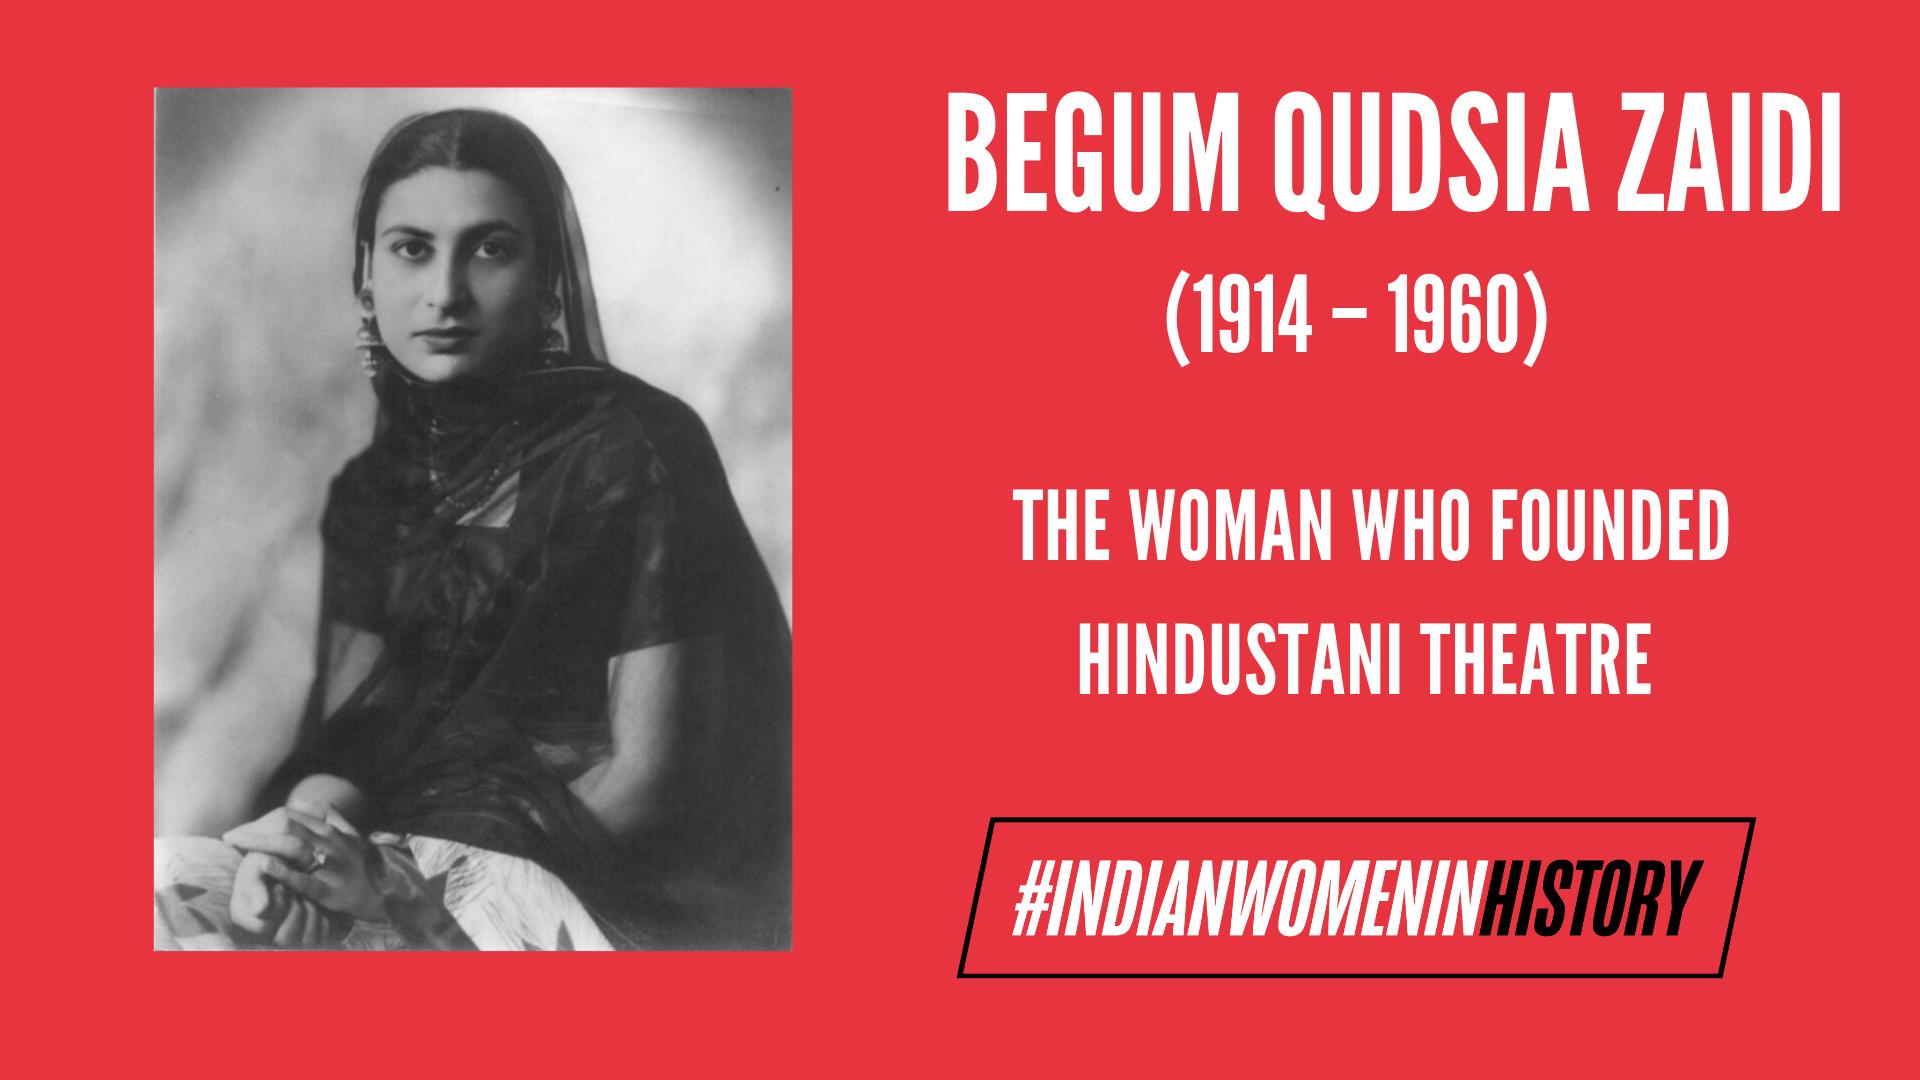 Begum Qudsia Zaidi: The Woman Who Founded Hindustani Theatre |#IndianWomenInHistory